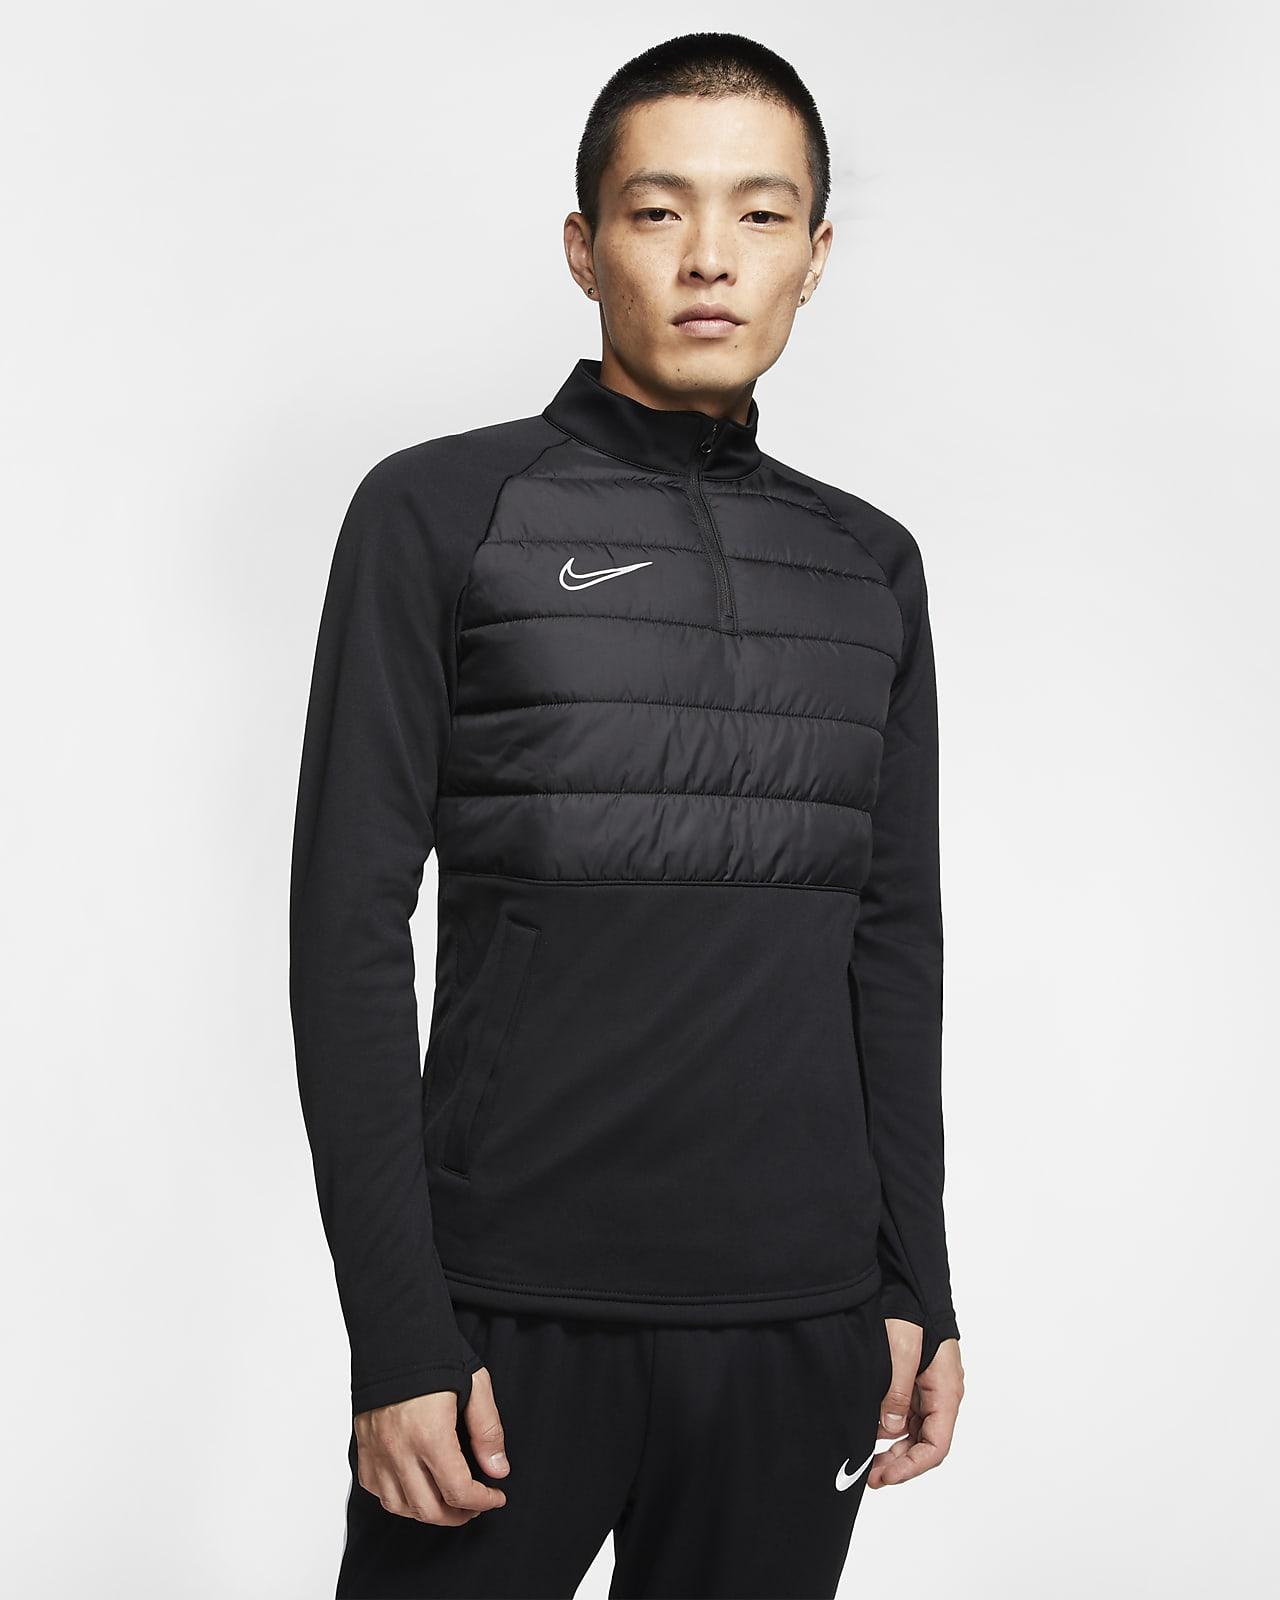 Nike Dri-FIT Academy Winter Warrior Erkek Futbol Antrenman Üstü